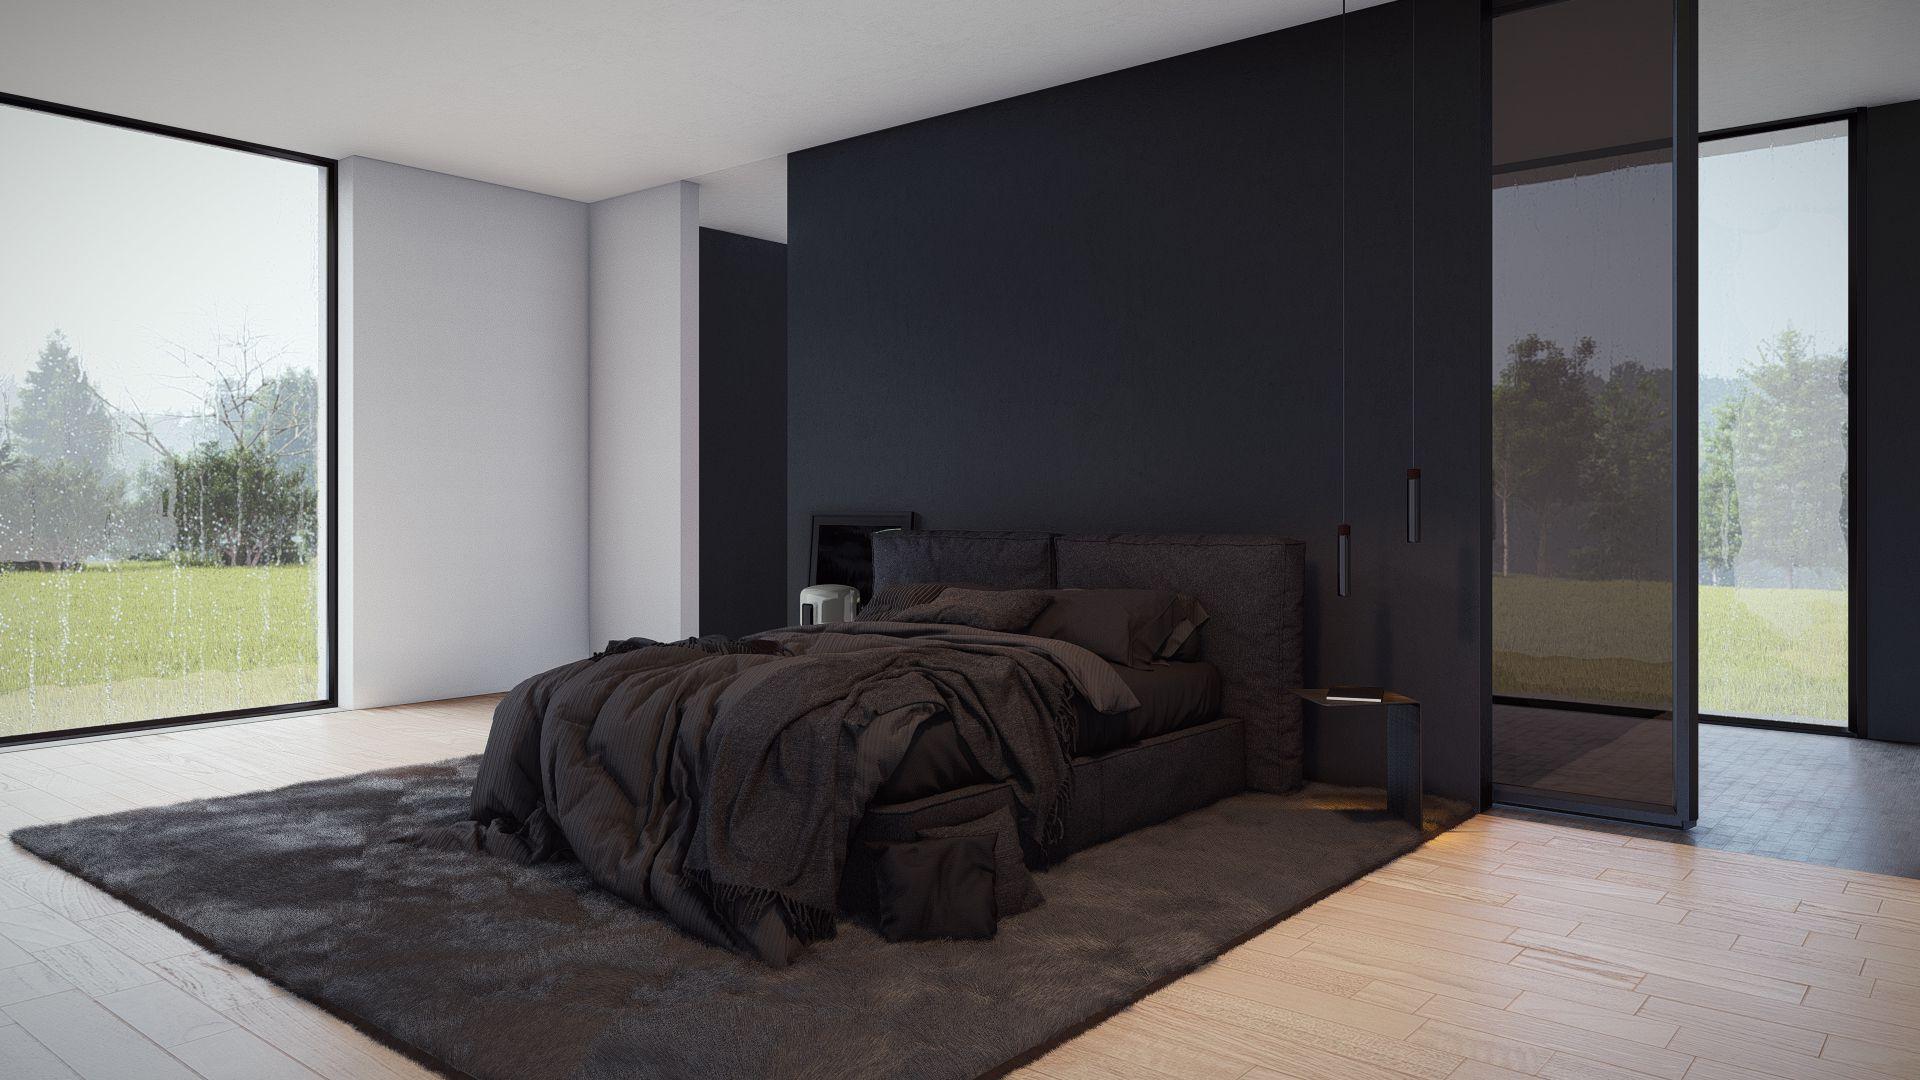 bedroom interor 3d visualization 2 1